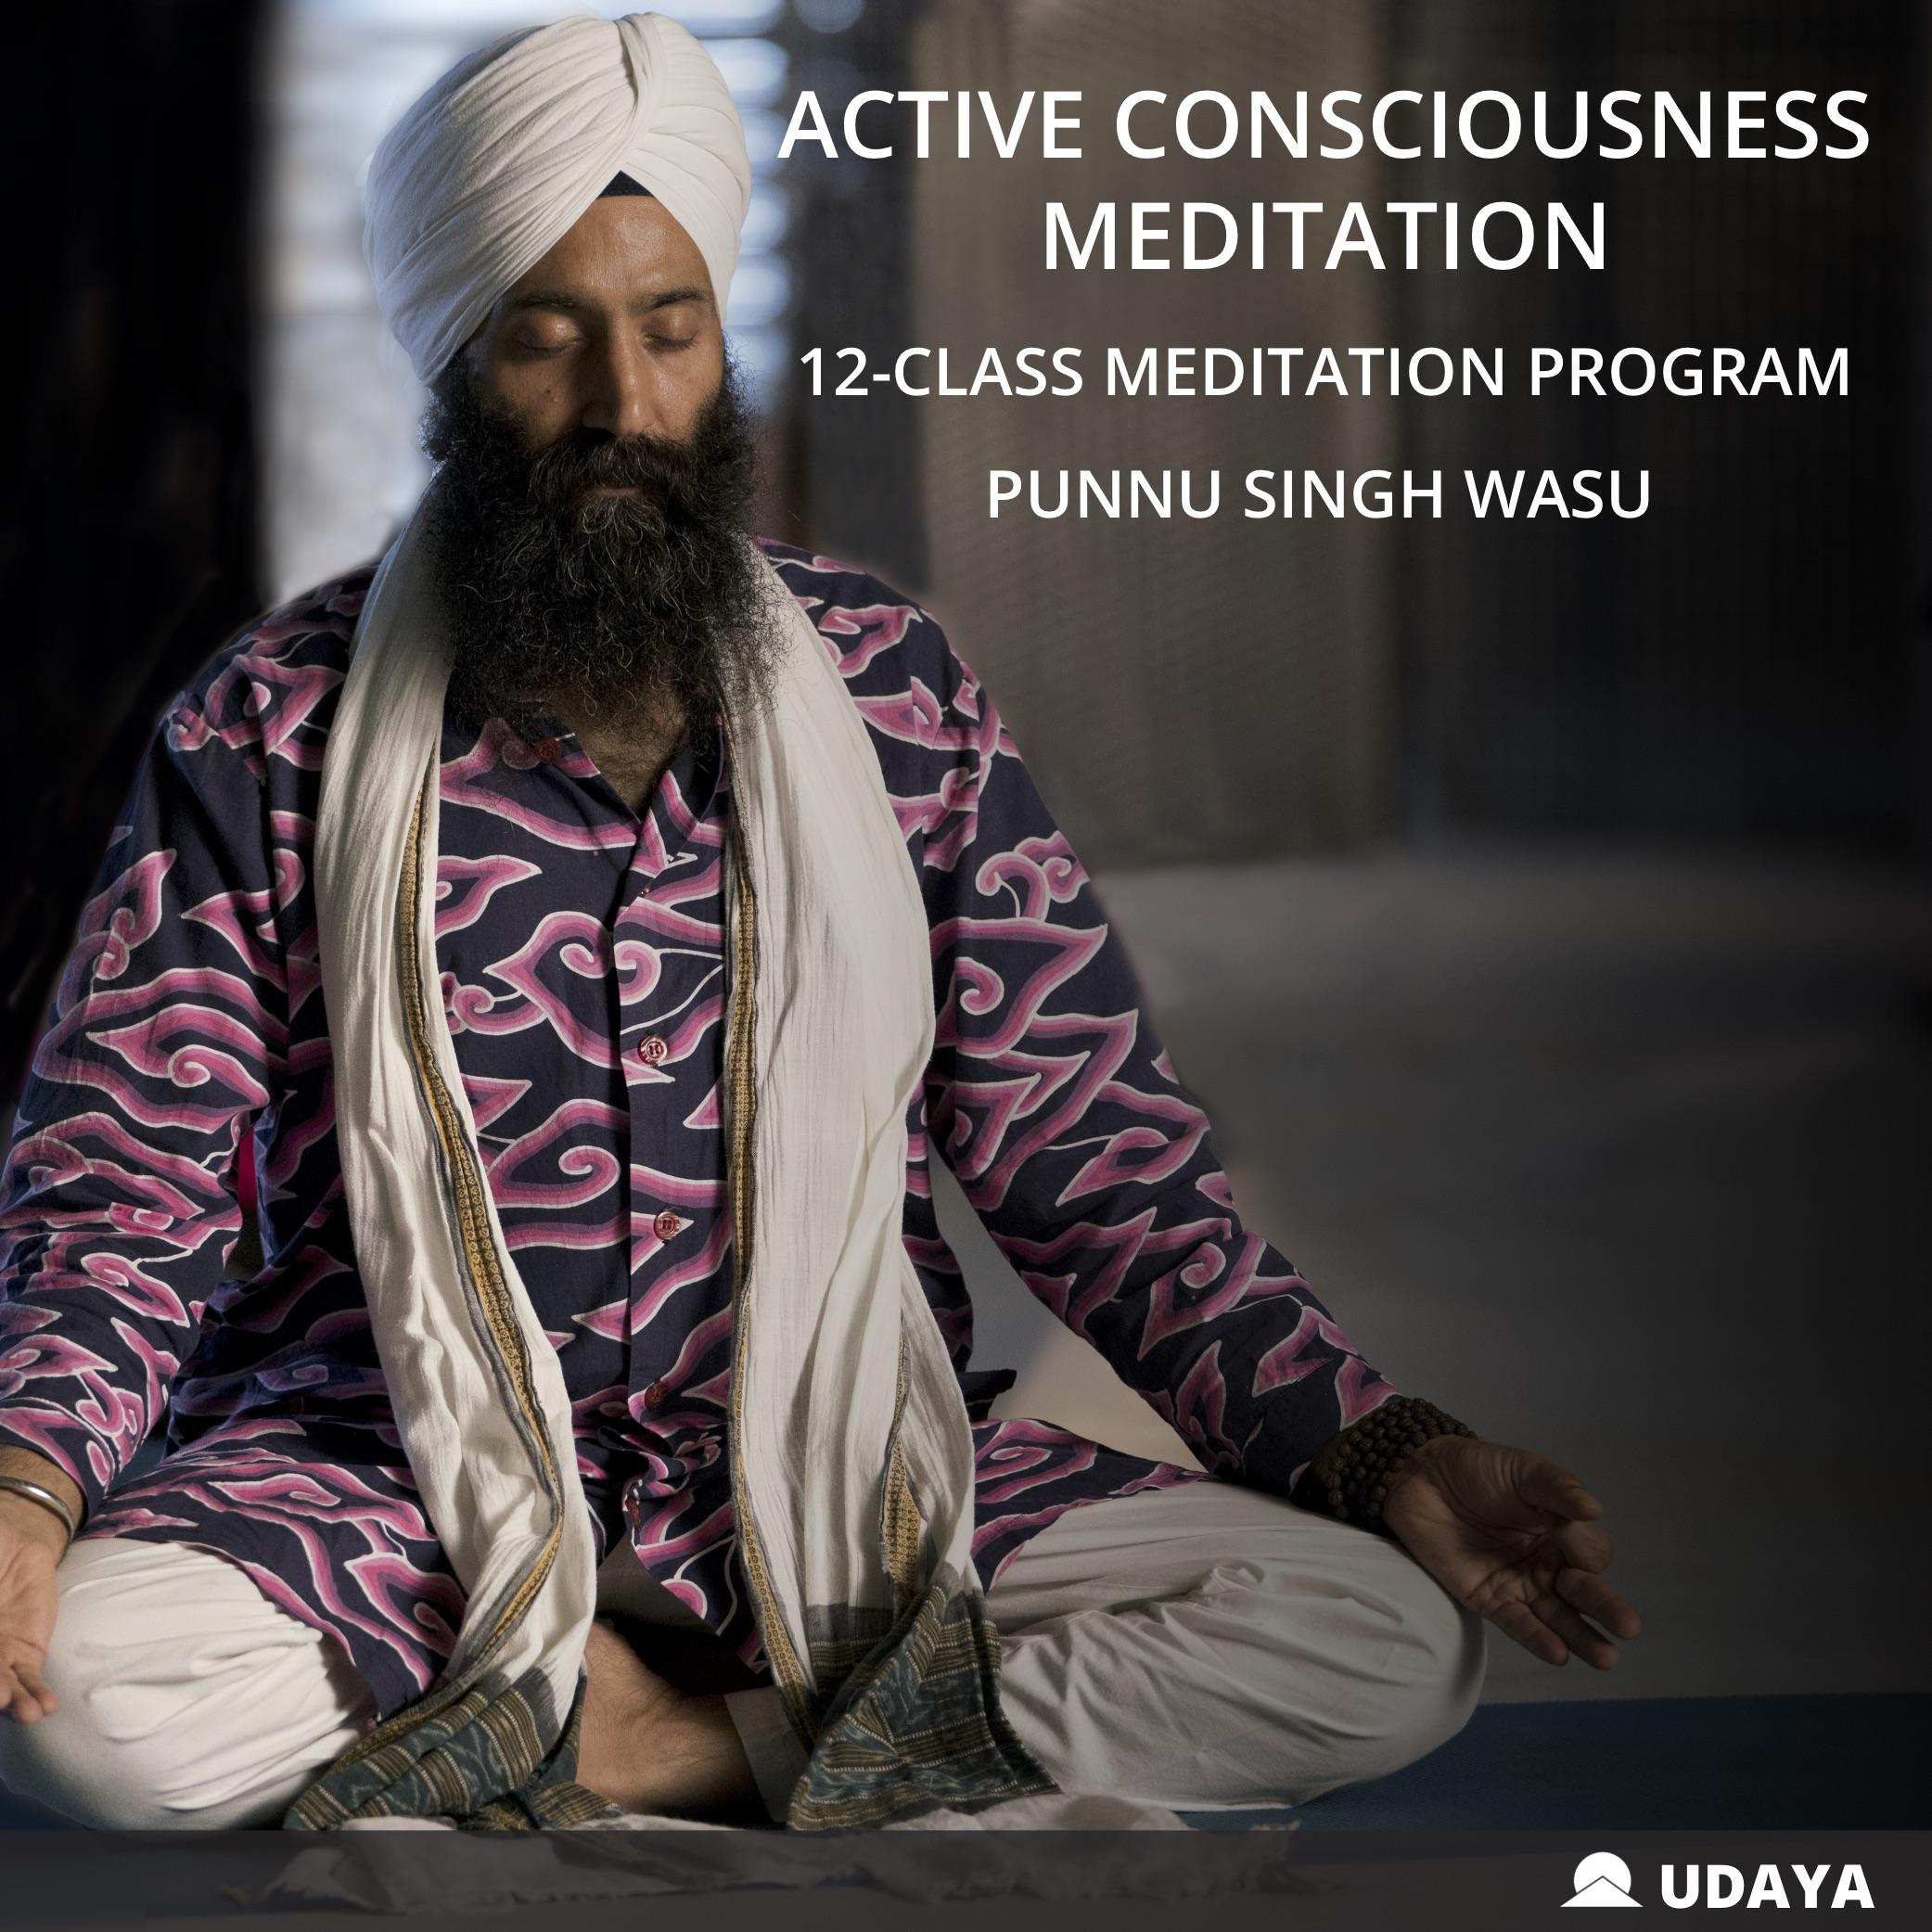 Active Consciousness Meditation with Punnu Singh Wasu on UDAYA.com